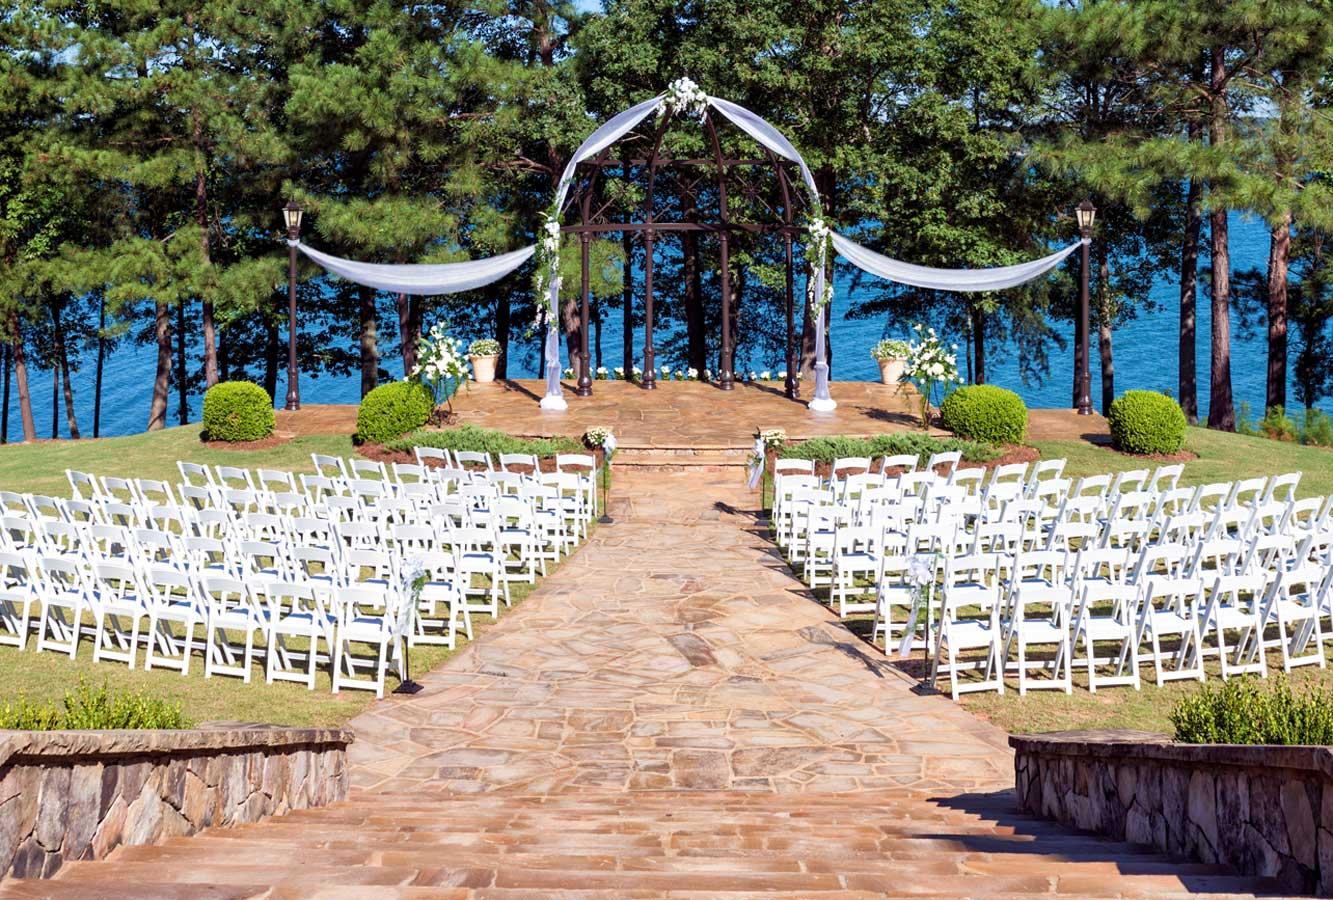 Lanier islands wedding venues in buford ga for Wedding venues in buford ga